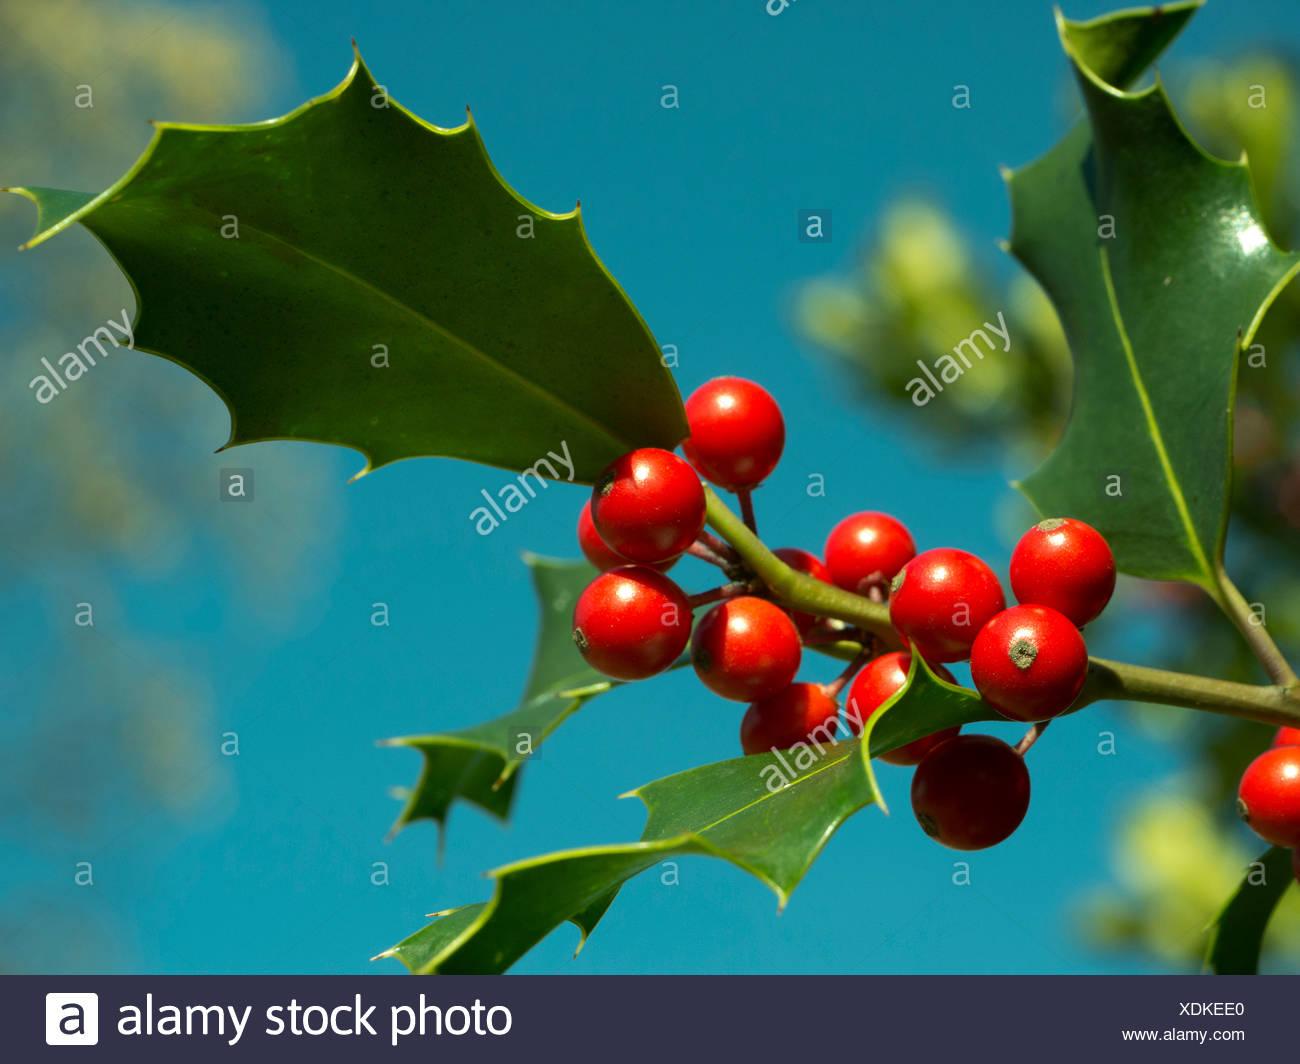 berry, drupe, Emmental, flora, fruit, shrub, bush, toxicity, inflorescence, leaf, red, nature, canton Bern, Lüderenalp, Switzerl - Stock Image